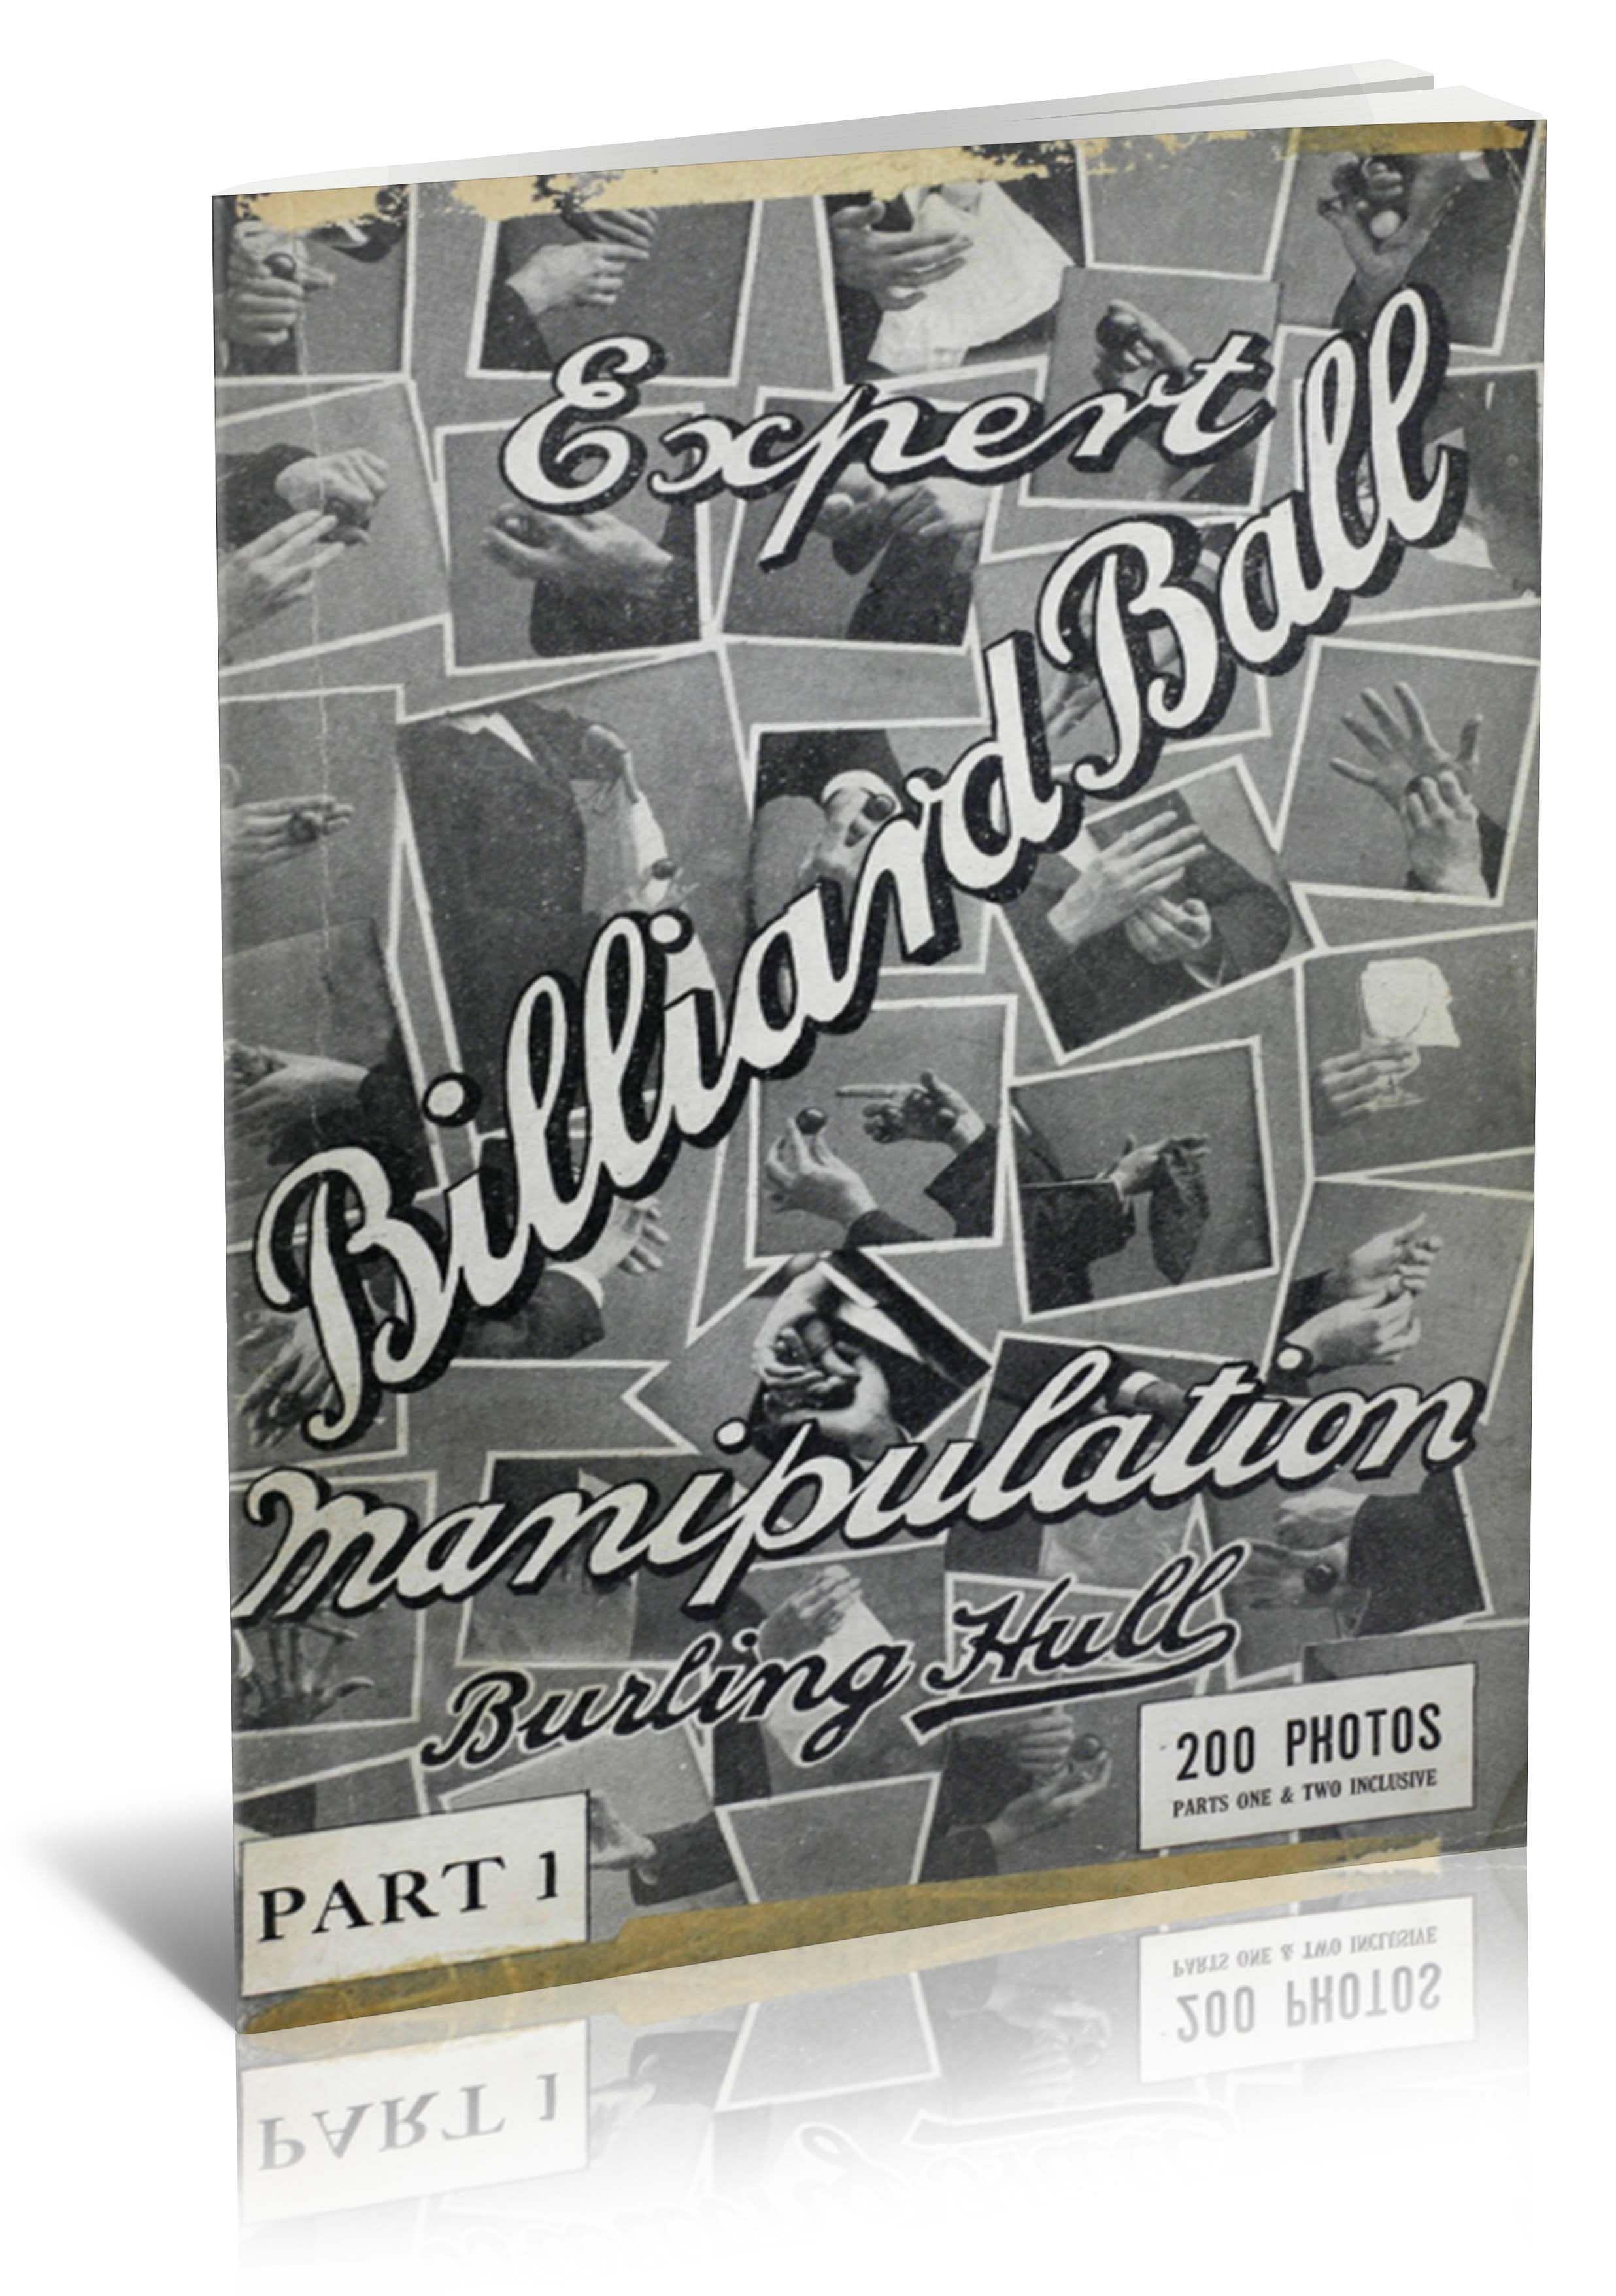 Expert Billiard Ball Manipulation 1 - magic